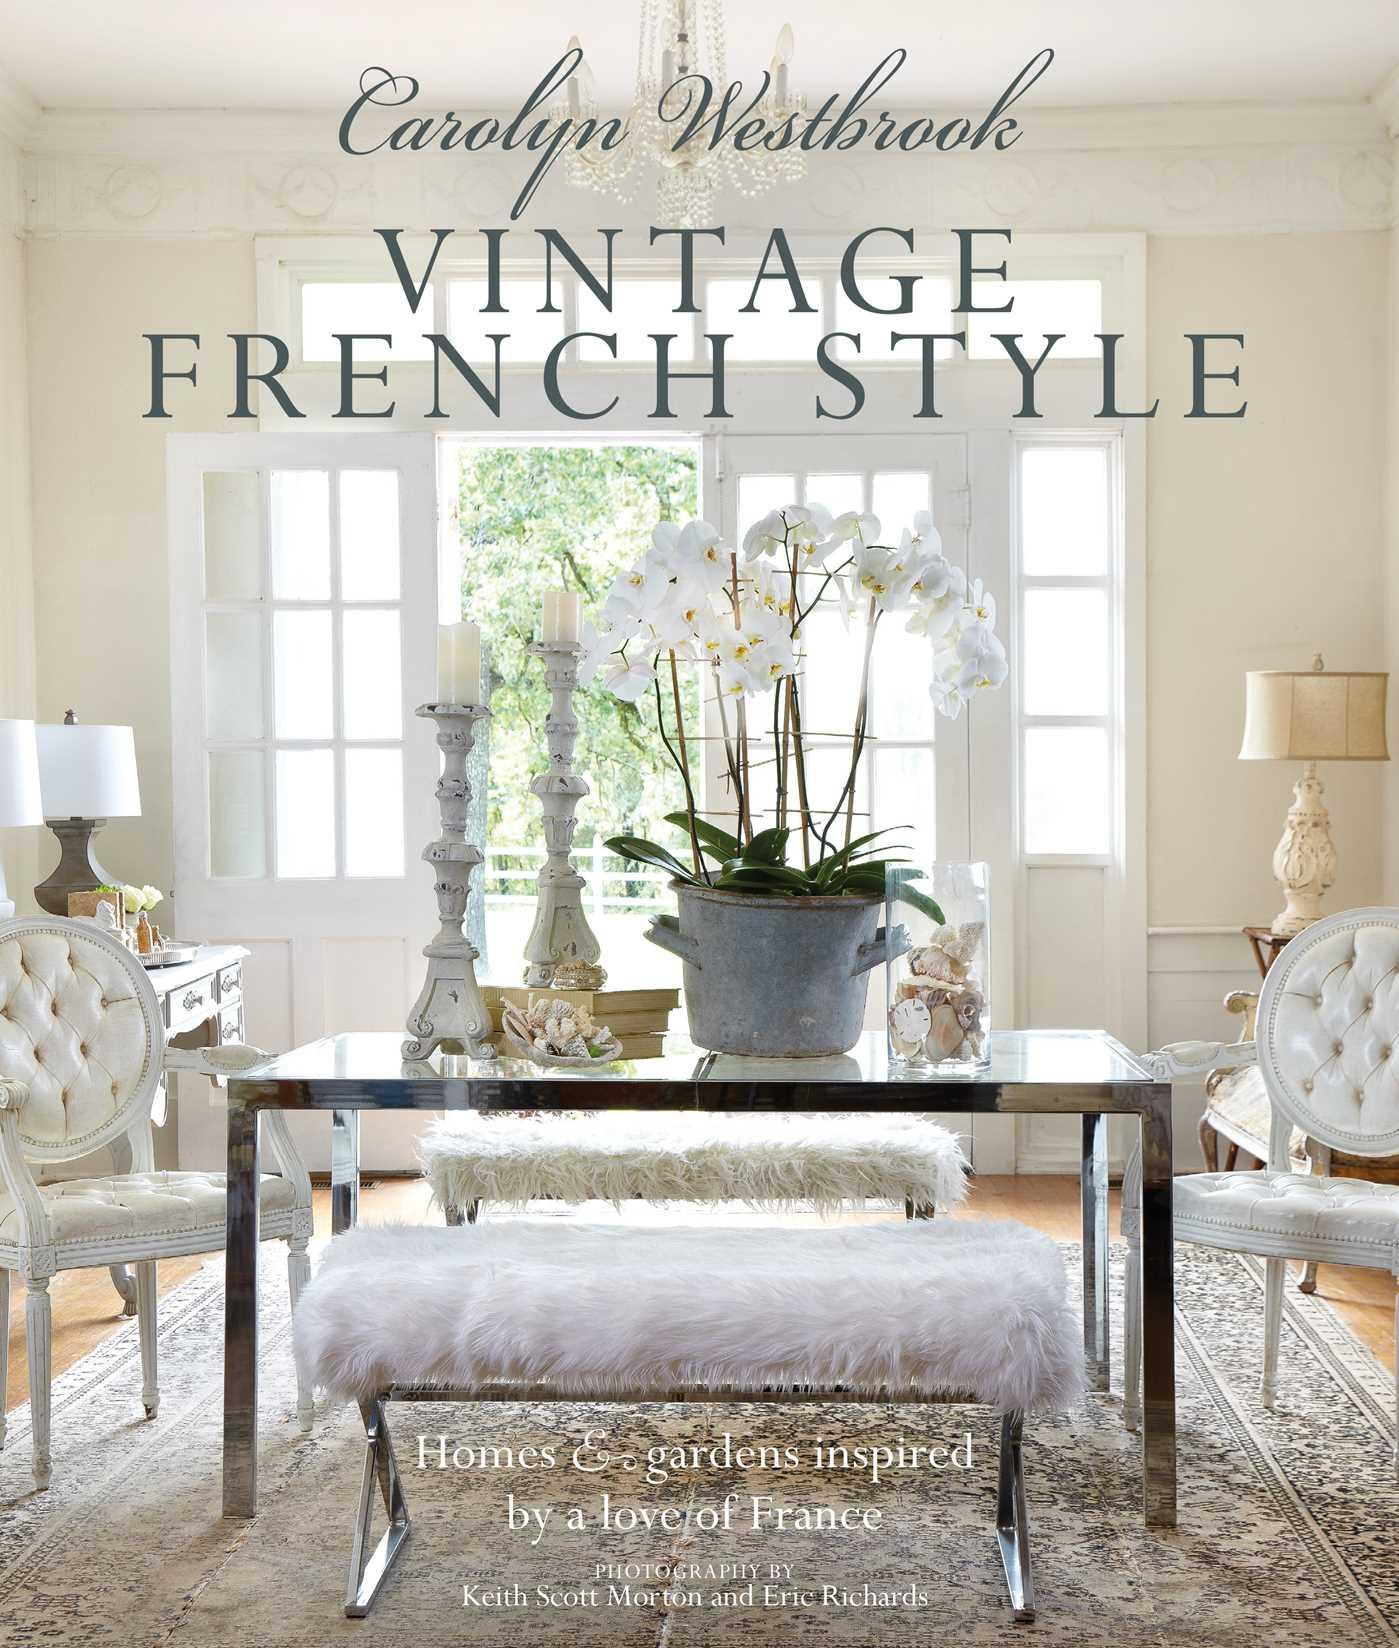 Carolyn Westbrook: Vintage French Style | Book by Carolyn Westbrook ...